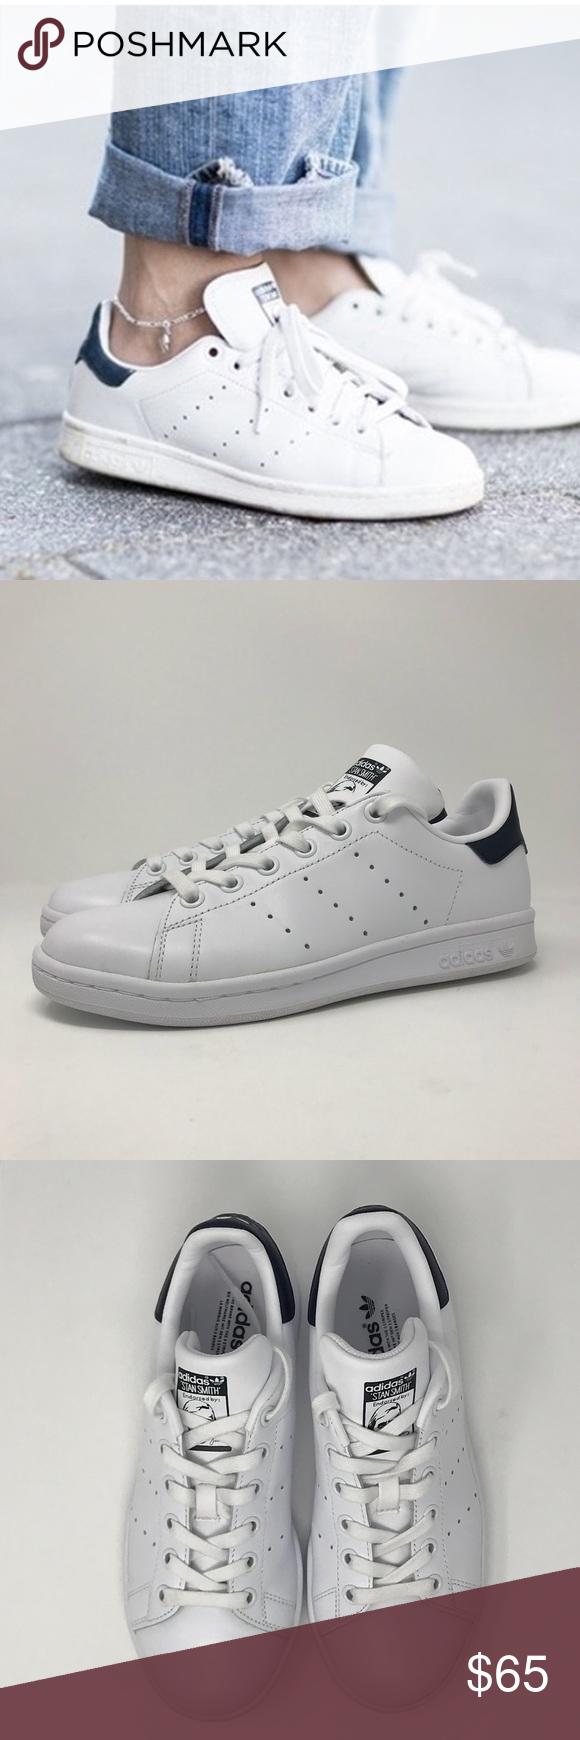 Adidas Stan Smith Marina Scarpe Sz 5 Autentici Originali Adidas Stan